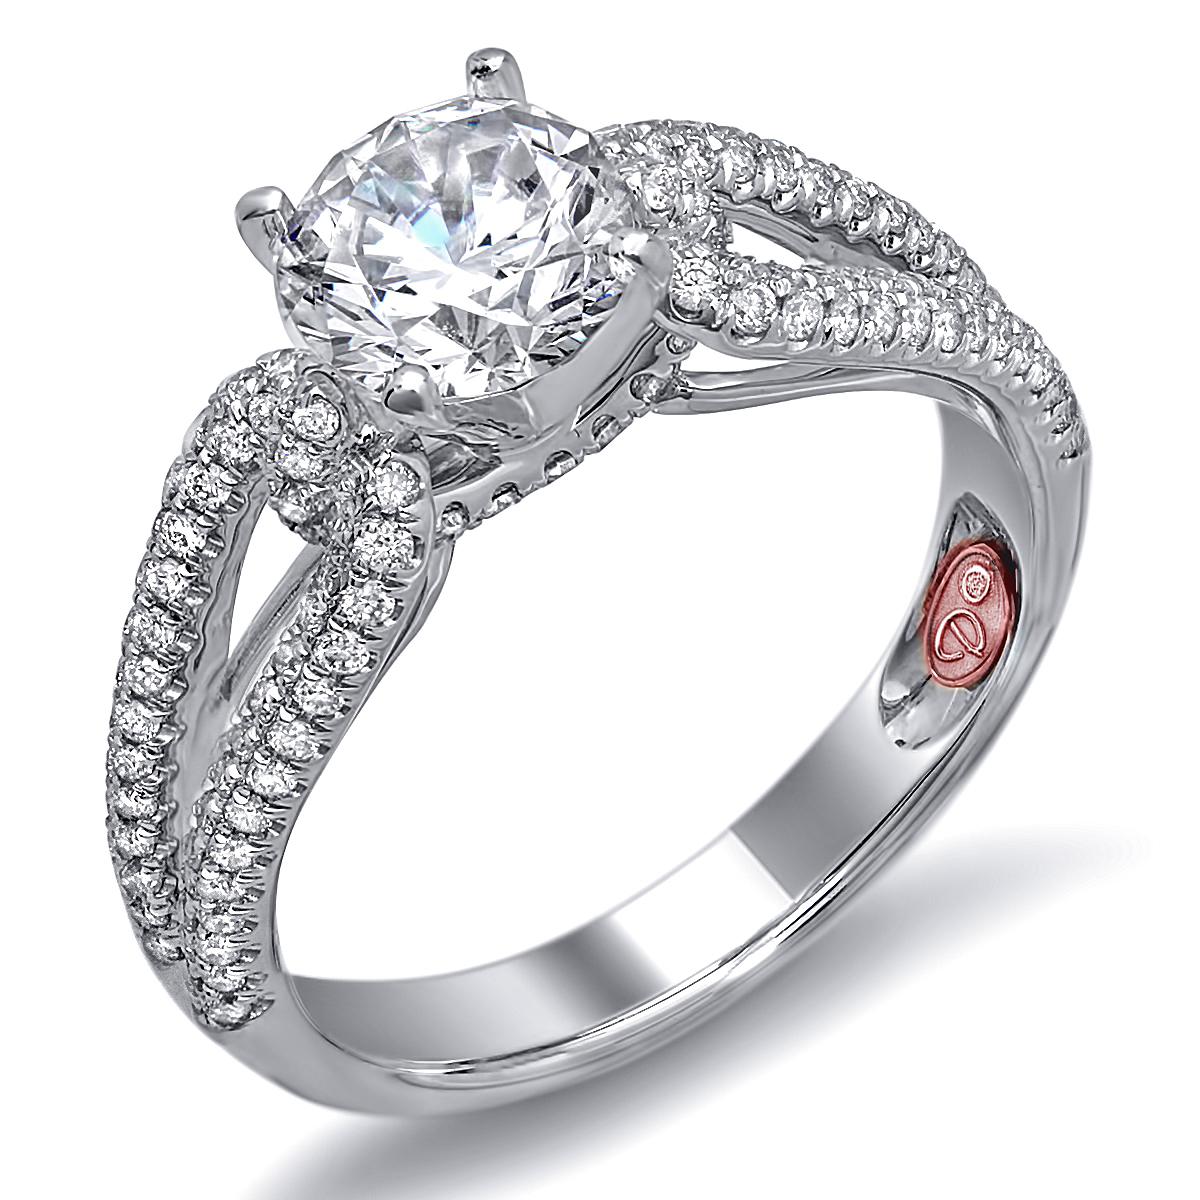 demarco bridal jewelry official blog designer engagement rings. Black Bedroom Furniture Sets. Home Design Ideas